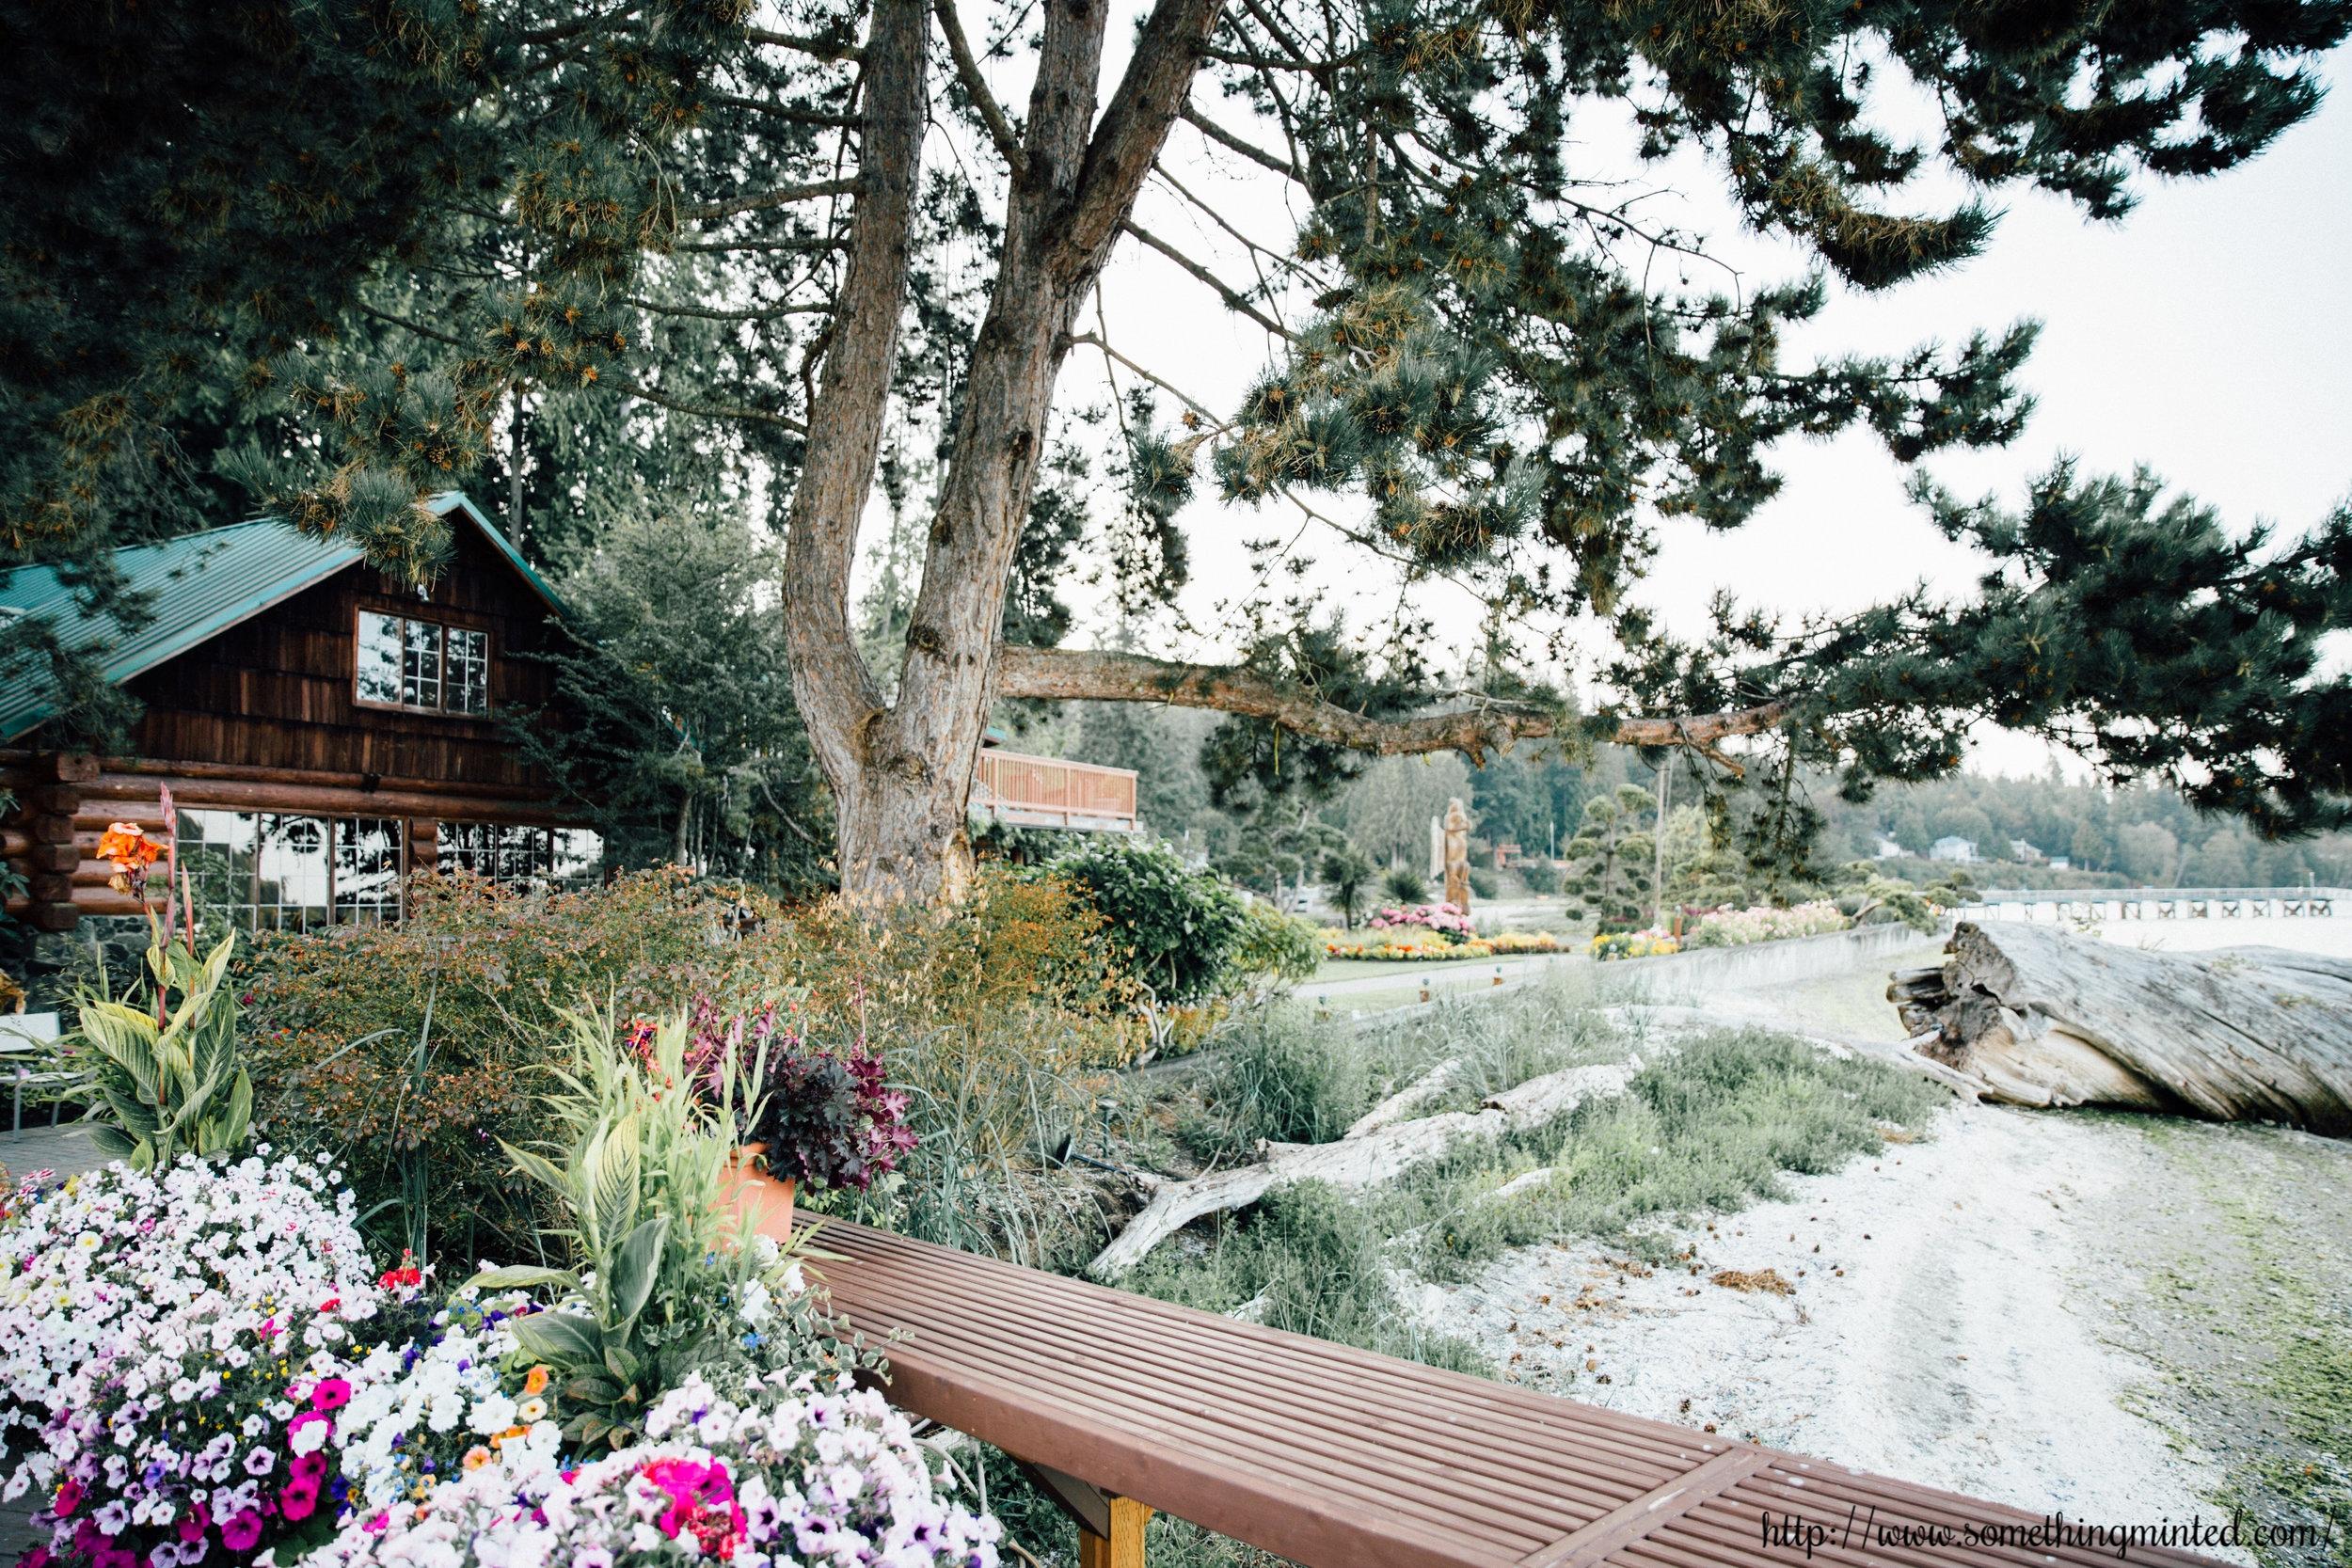 Kiana Lodge Wedding - Seattle Wedding Photographer - Something Minted Photography-685.jpg